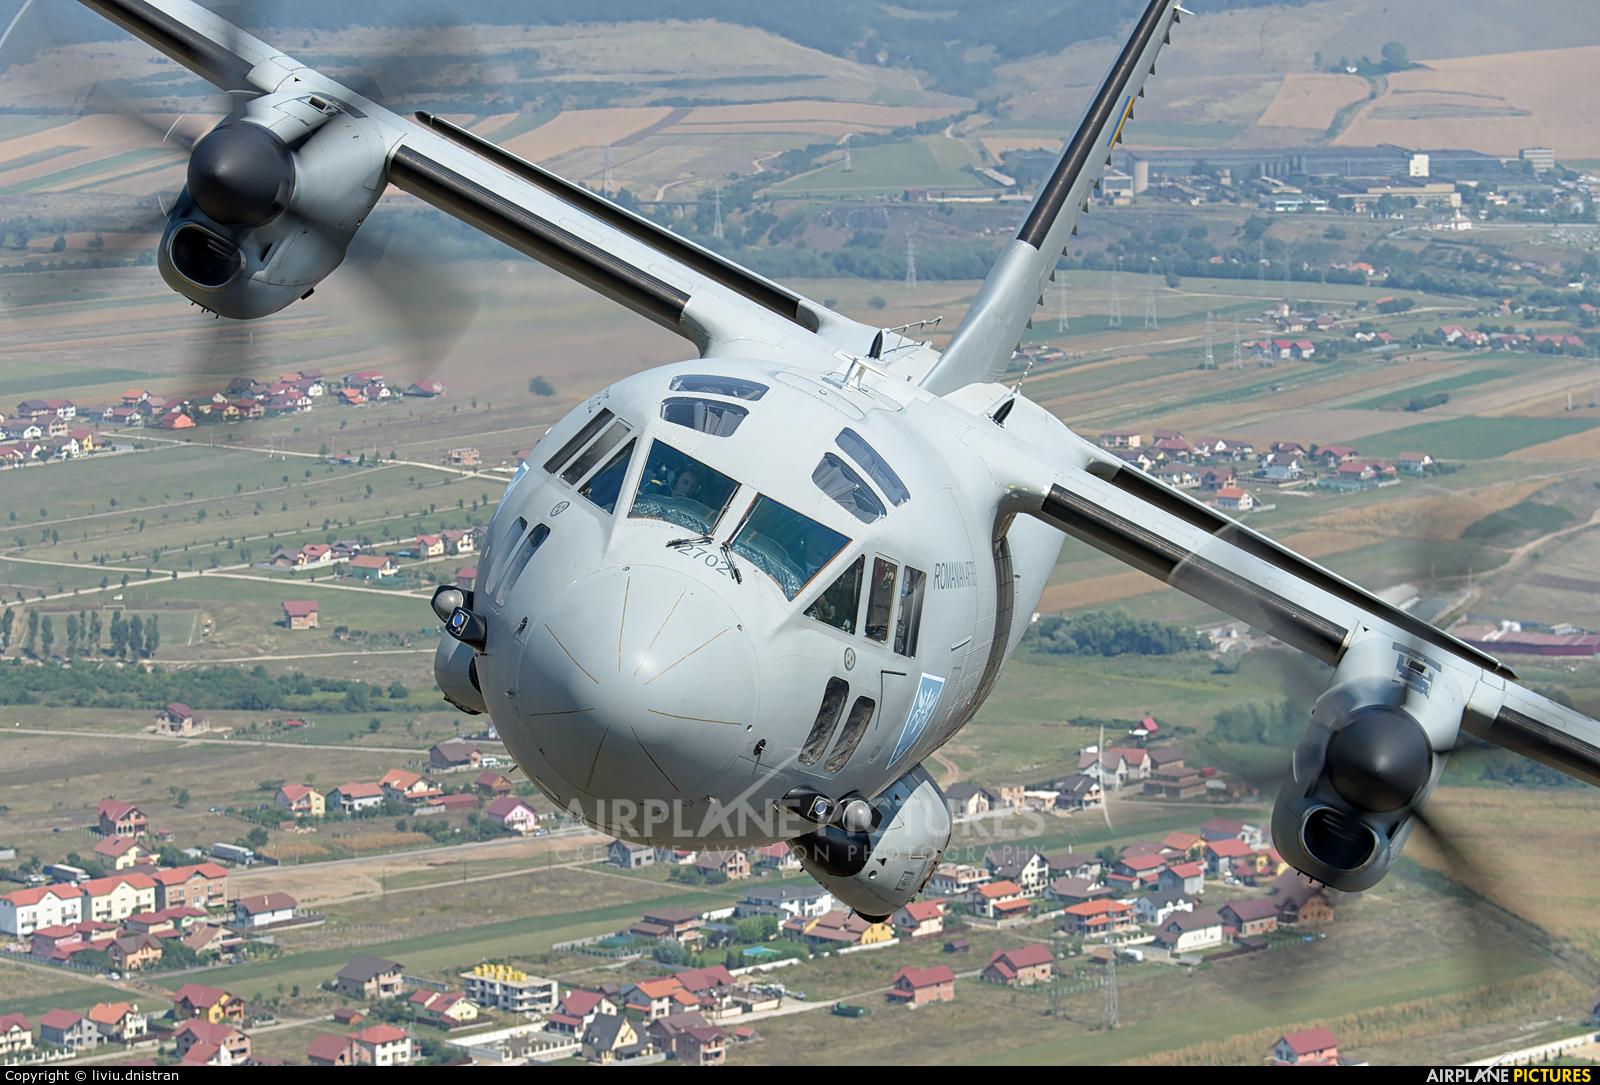 Romania - Air Force 2702 aircraft at In Flight - Romania